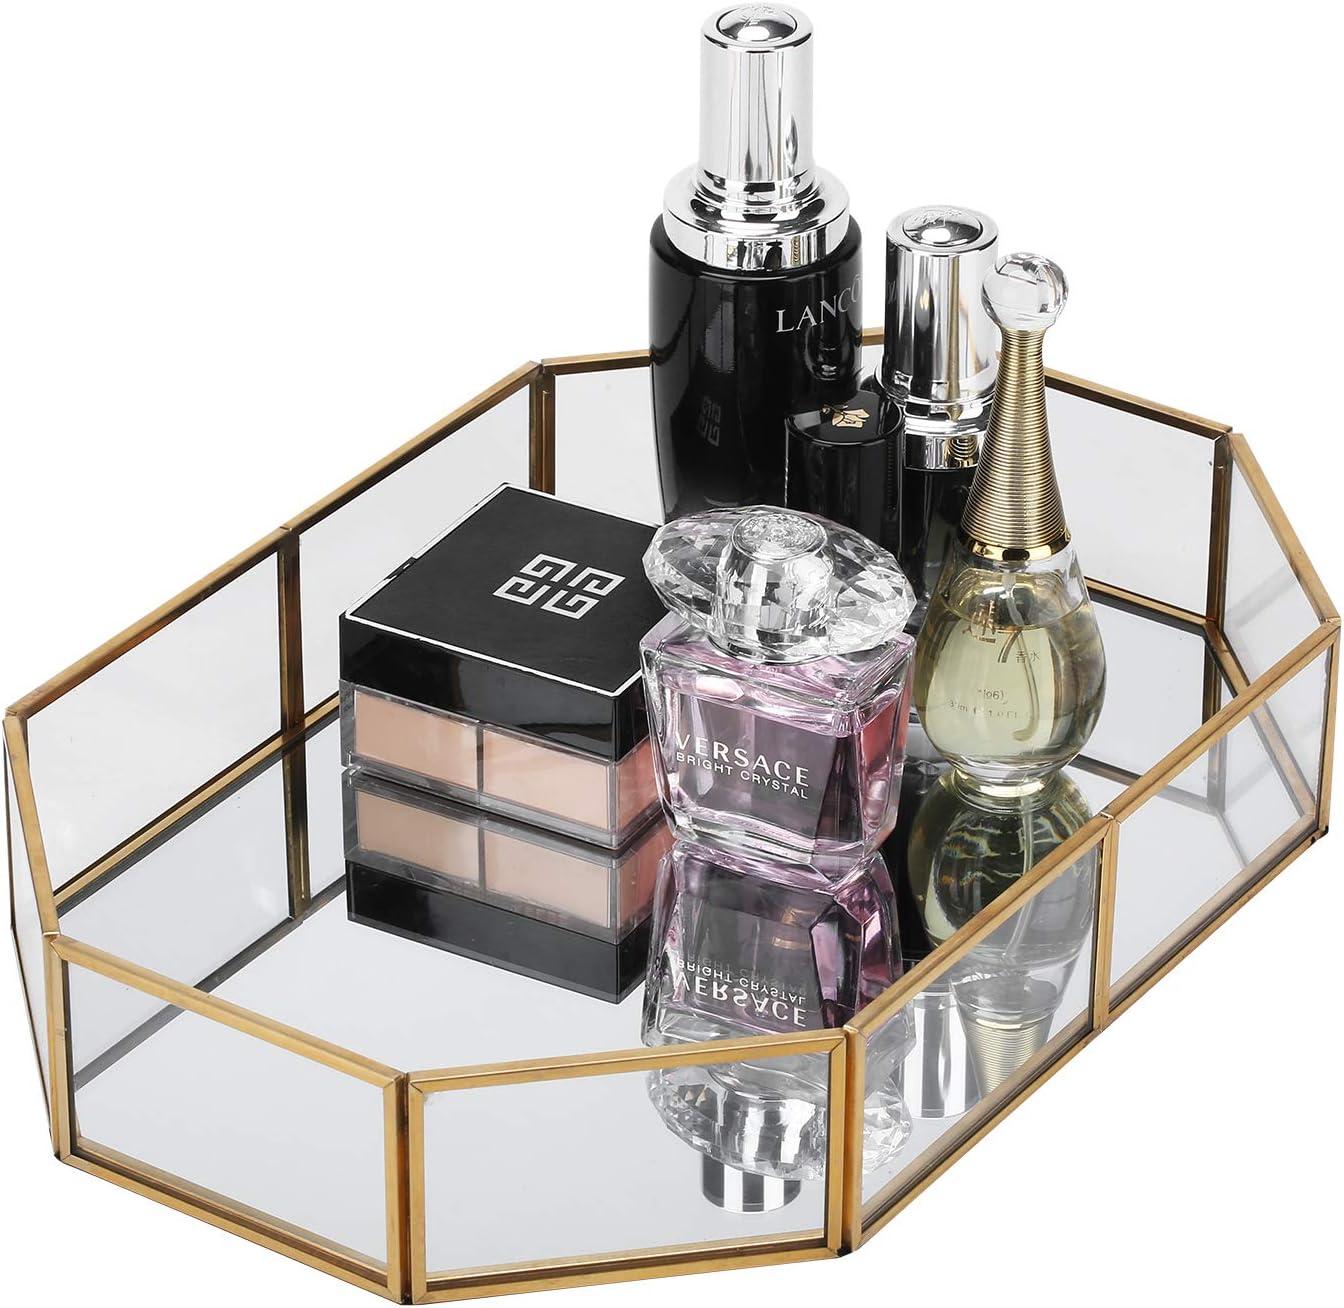 WaiTing Decorative Makeup Vanity Trays, Crystal Mirrored Cosmetic Jewelry Toiletries Trinket Home Decor Tray Handmade Glass Ornate Perfume Tray for Dresser Bedroom Bathroom Restaurant Hotel (Polygon)